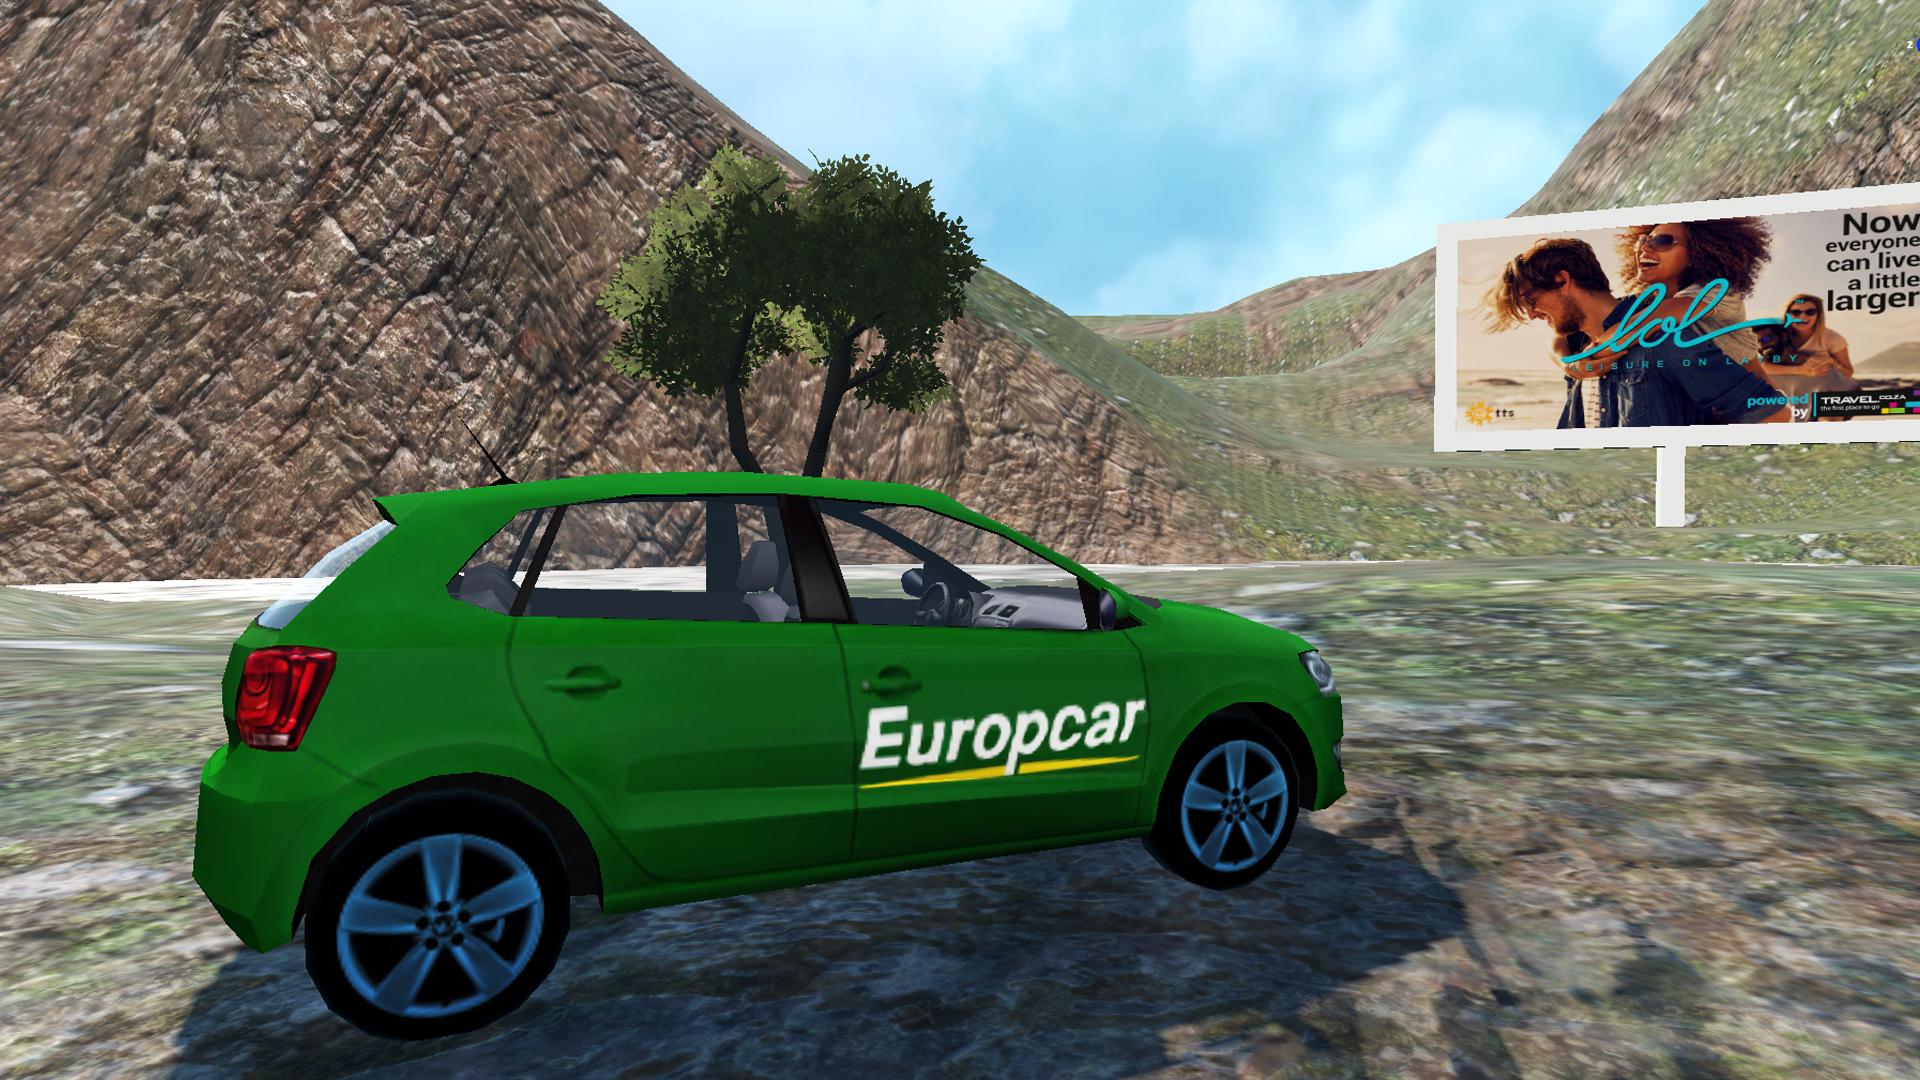 europcar-virtual-reality-experience